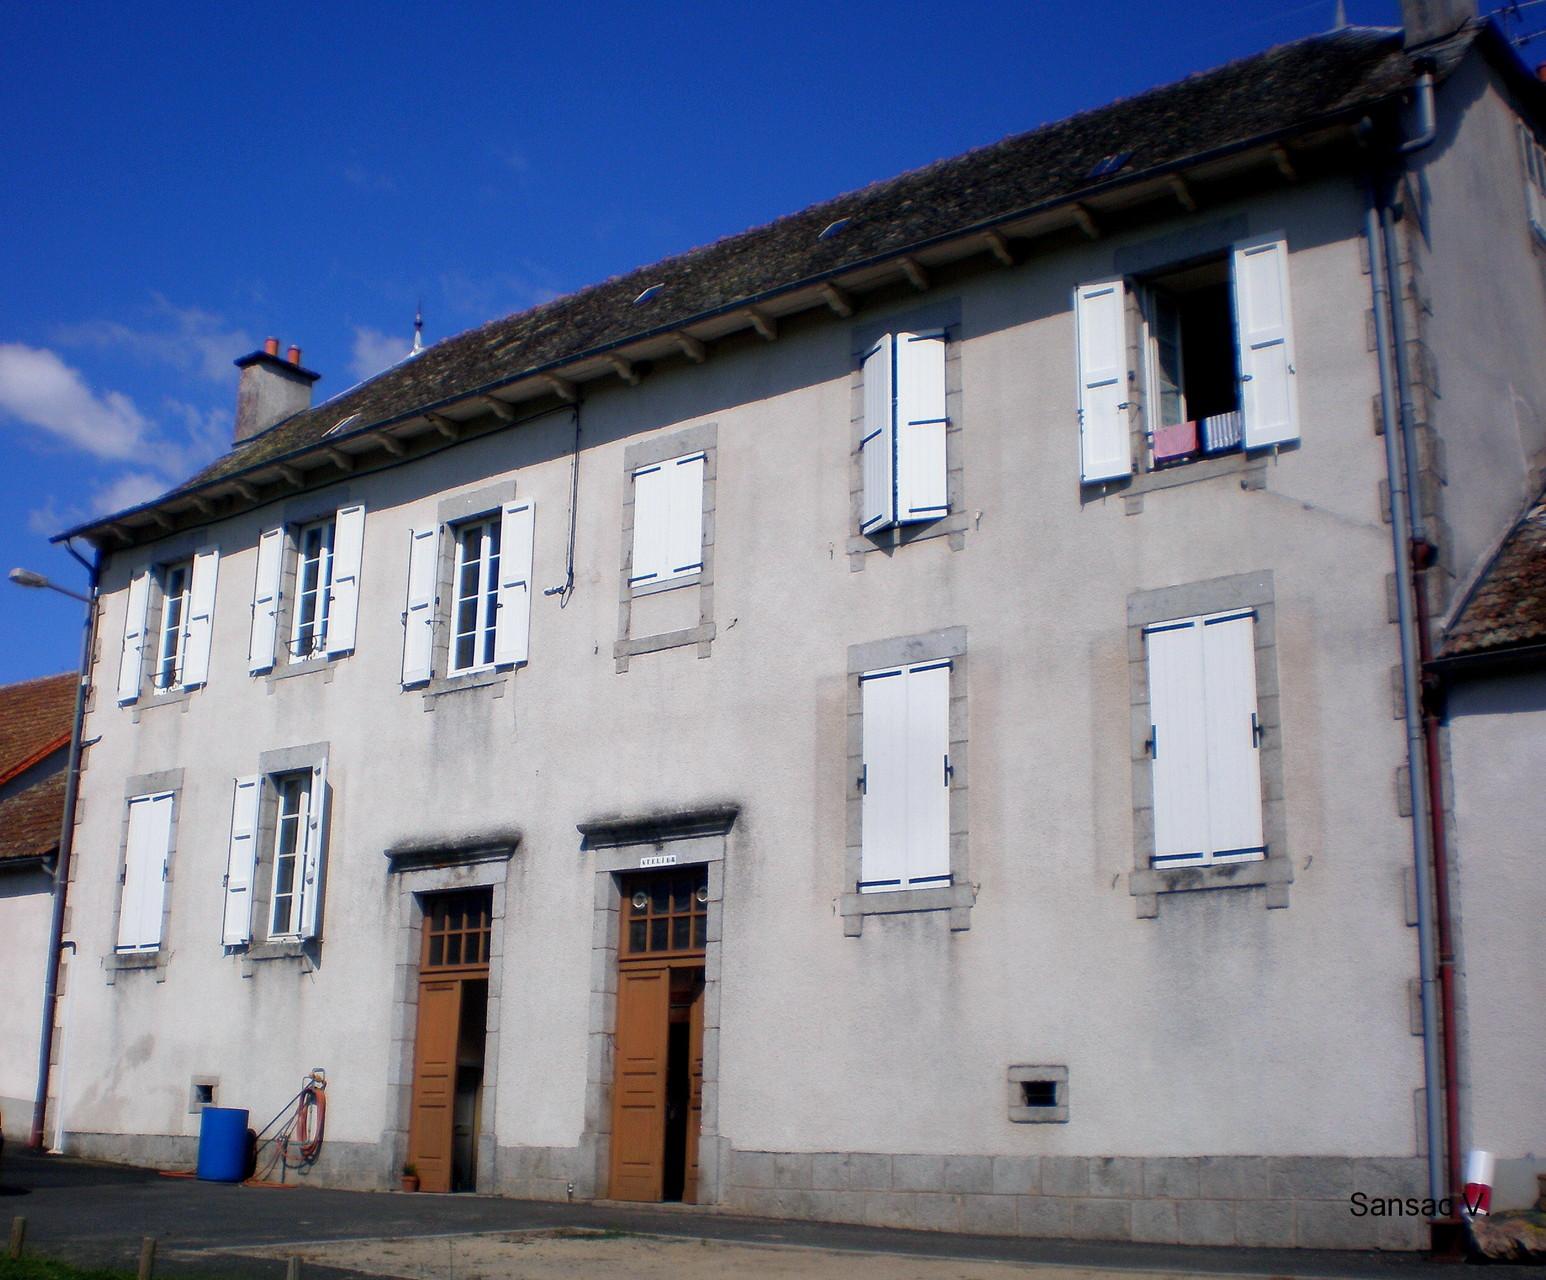 Ecole de Sansac-Veinazès